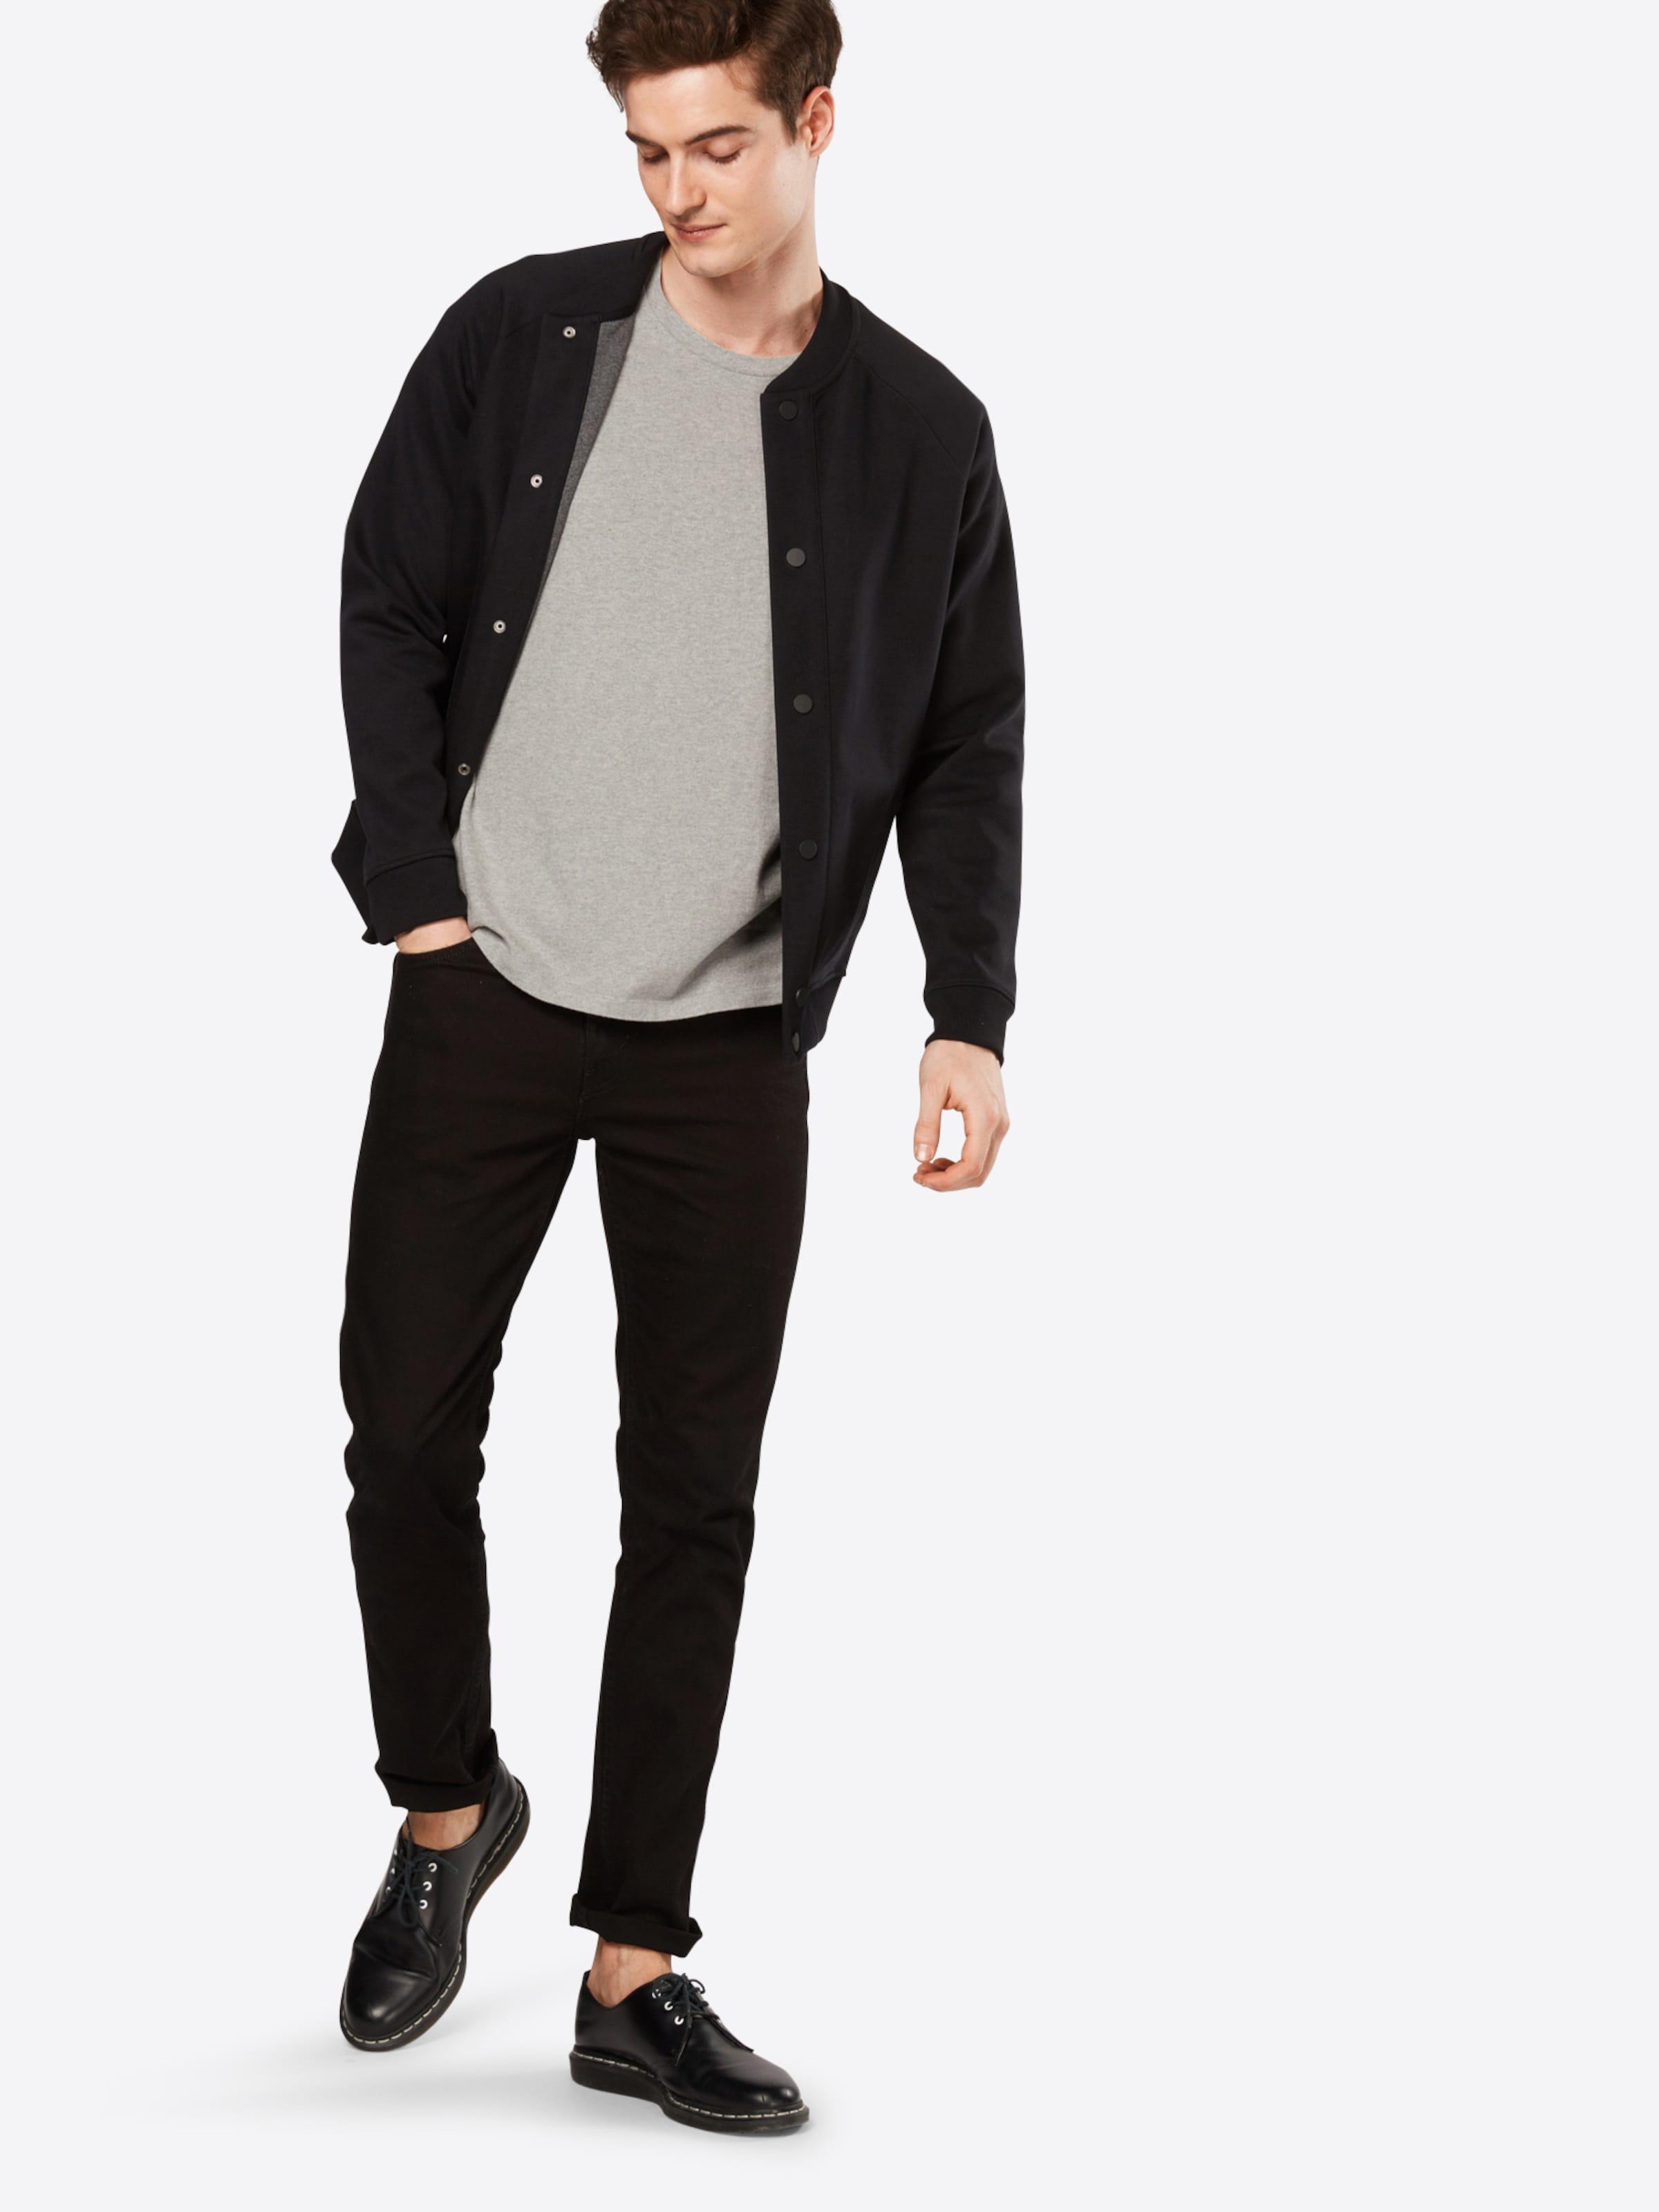 Levi's Line 8 T-Shirt 'L8 ATHLETIC BOXY TEE' Billig Verkauf Neuesten Kollektionen I5cOguP